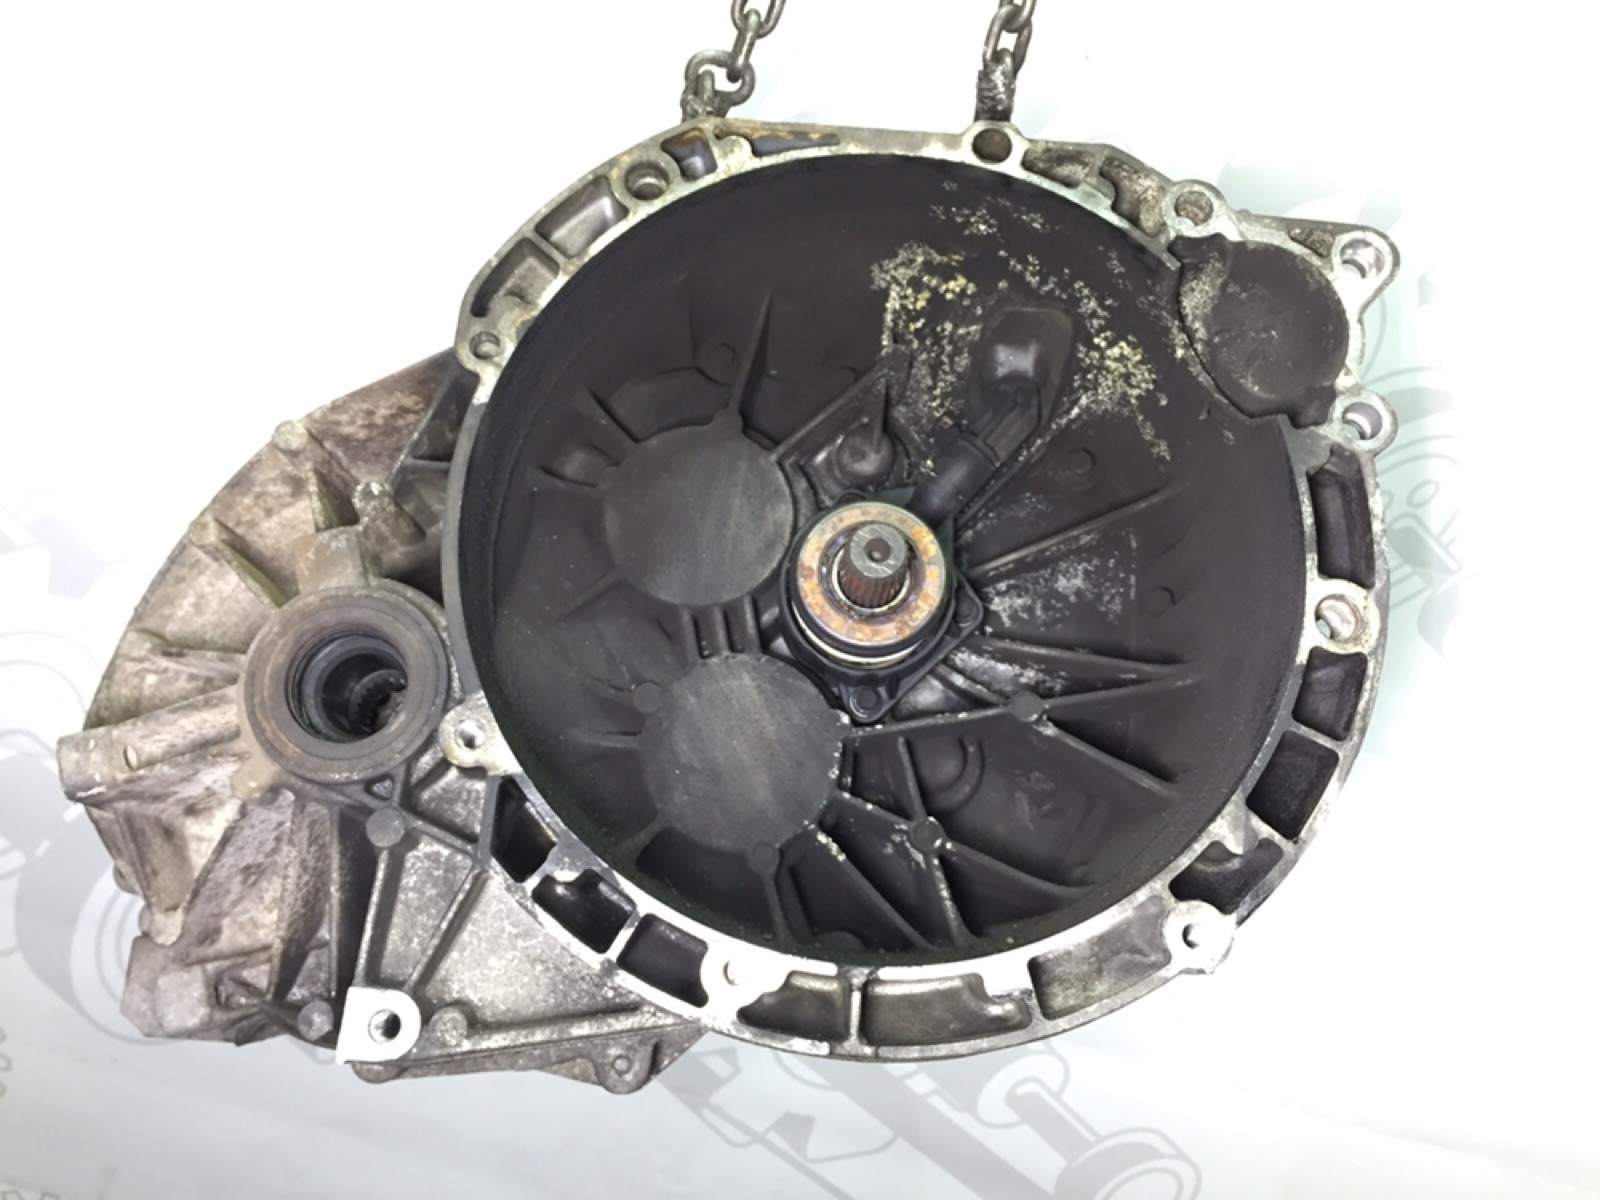 Кпп механическая (мкпп) Volvo V50 2.0 TD 2005 (б/у)